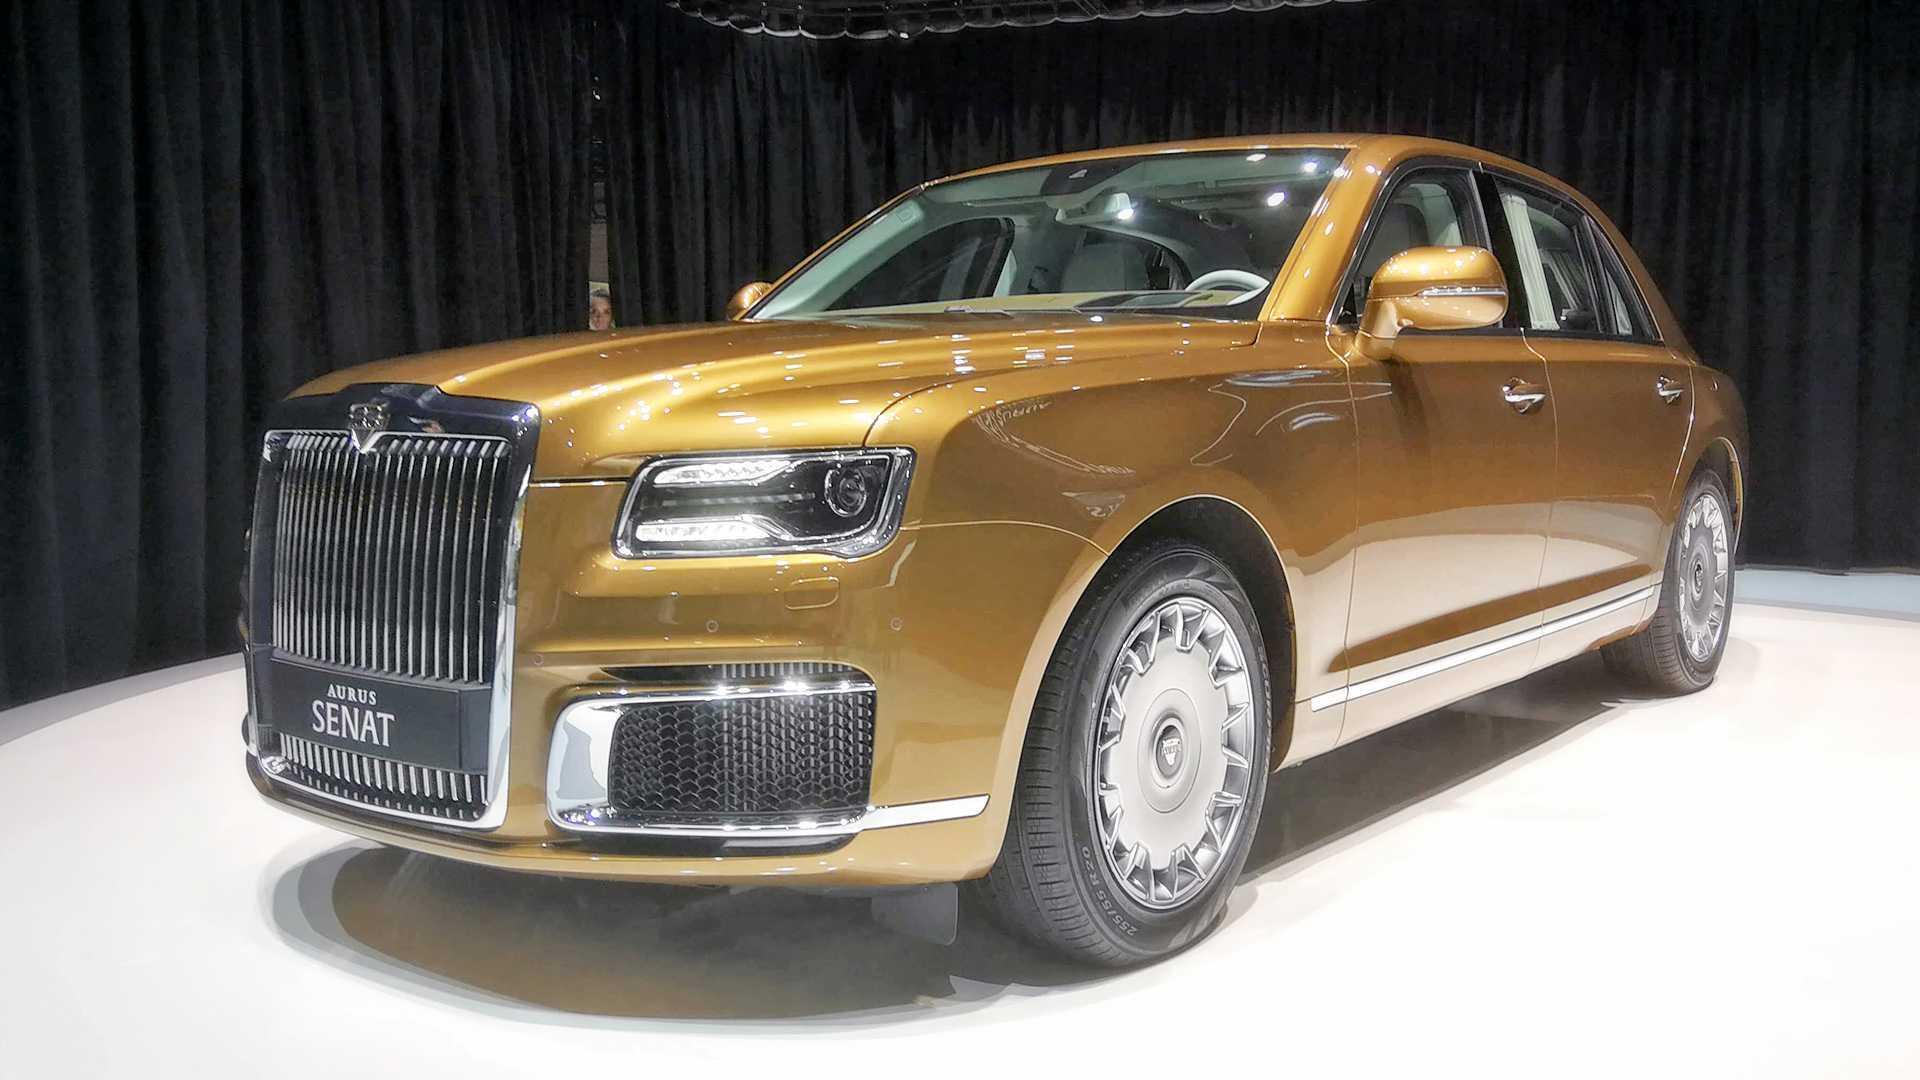 Aurus Senat S600 Shows Stately Shape In Geneva